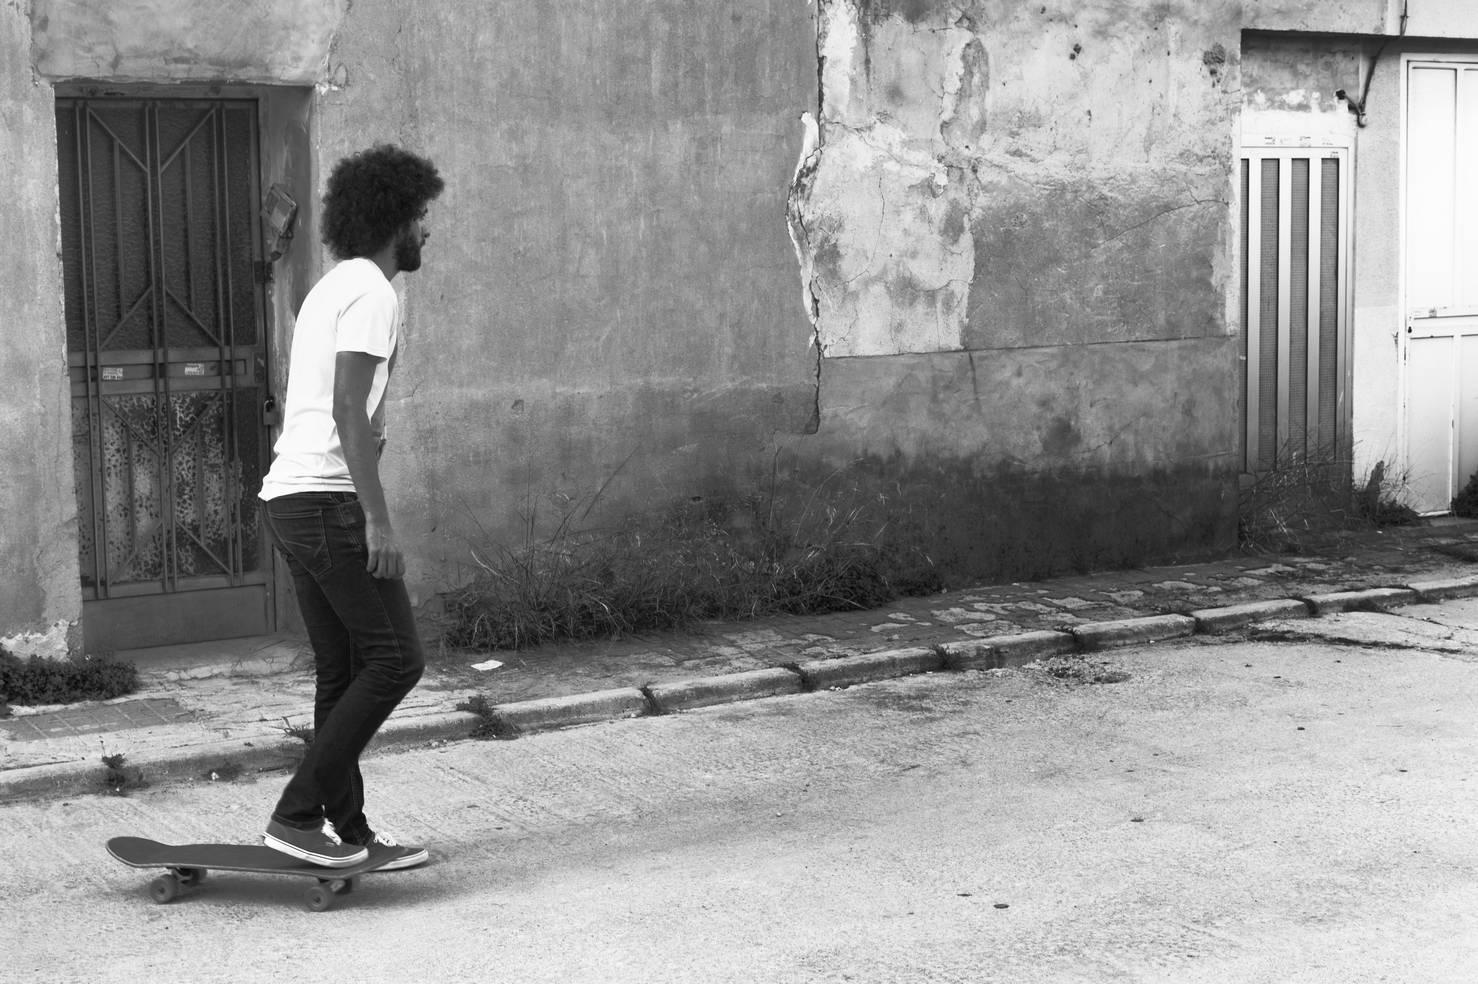 Rider/Long Days/Longboard